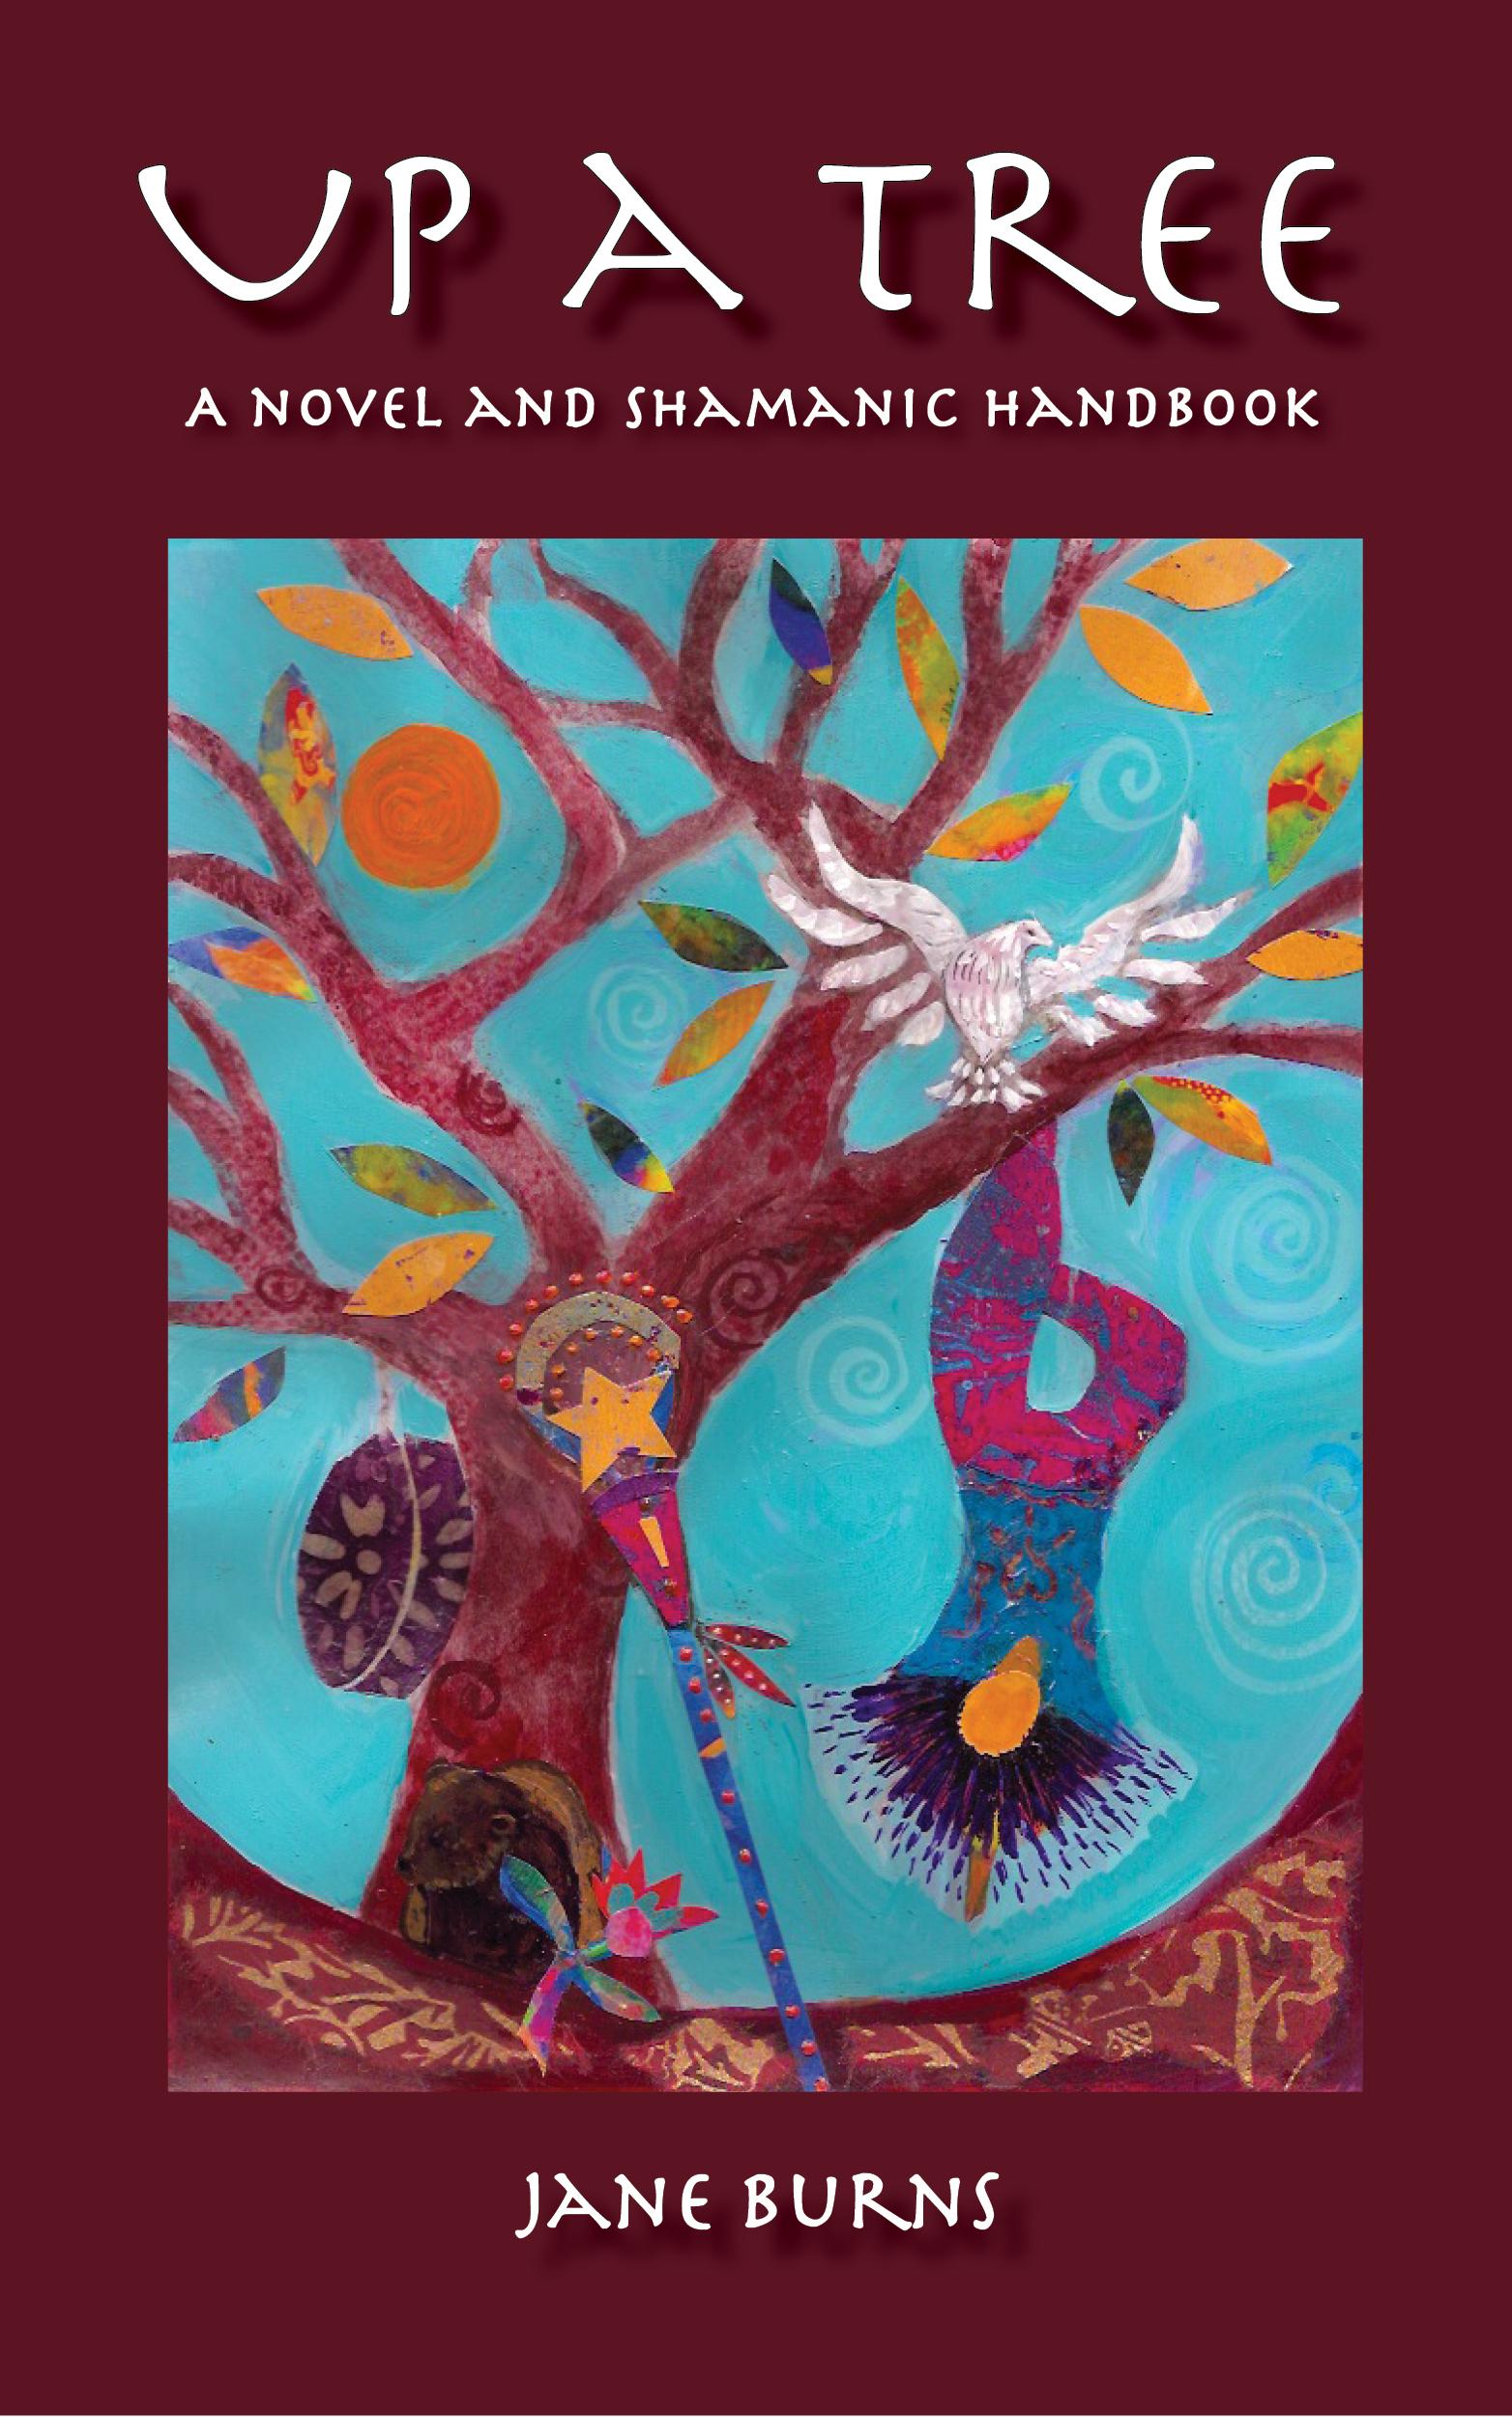 Up A Tree: A Novel and Shamanic Handbook by Jane Burns